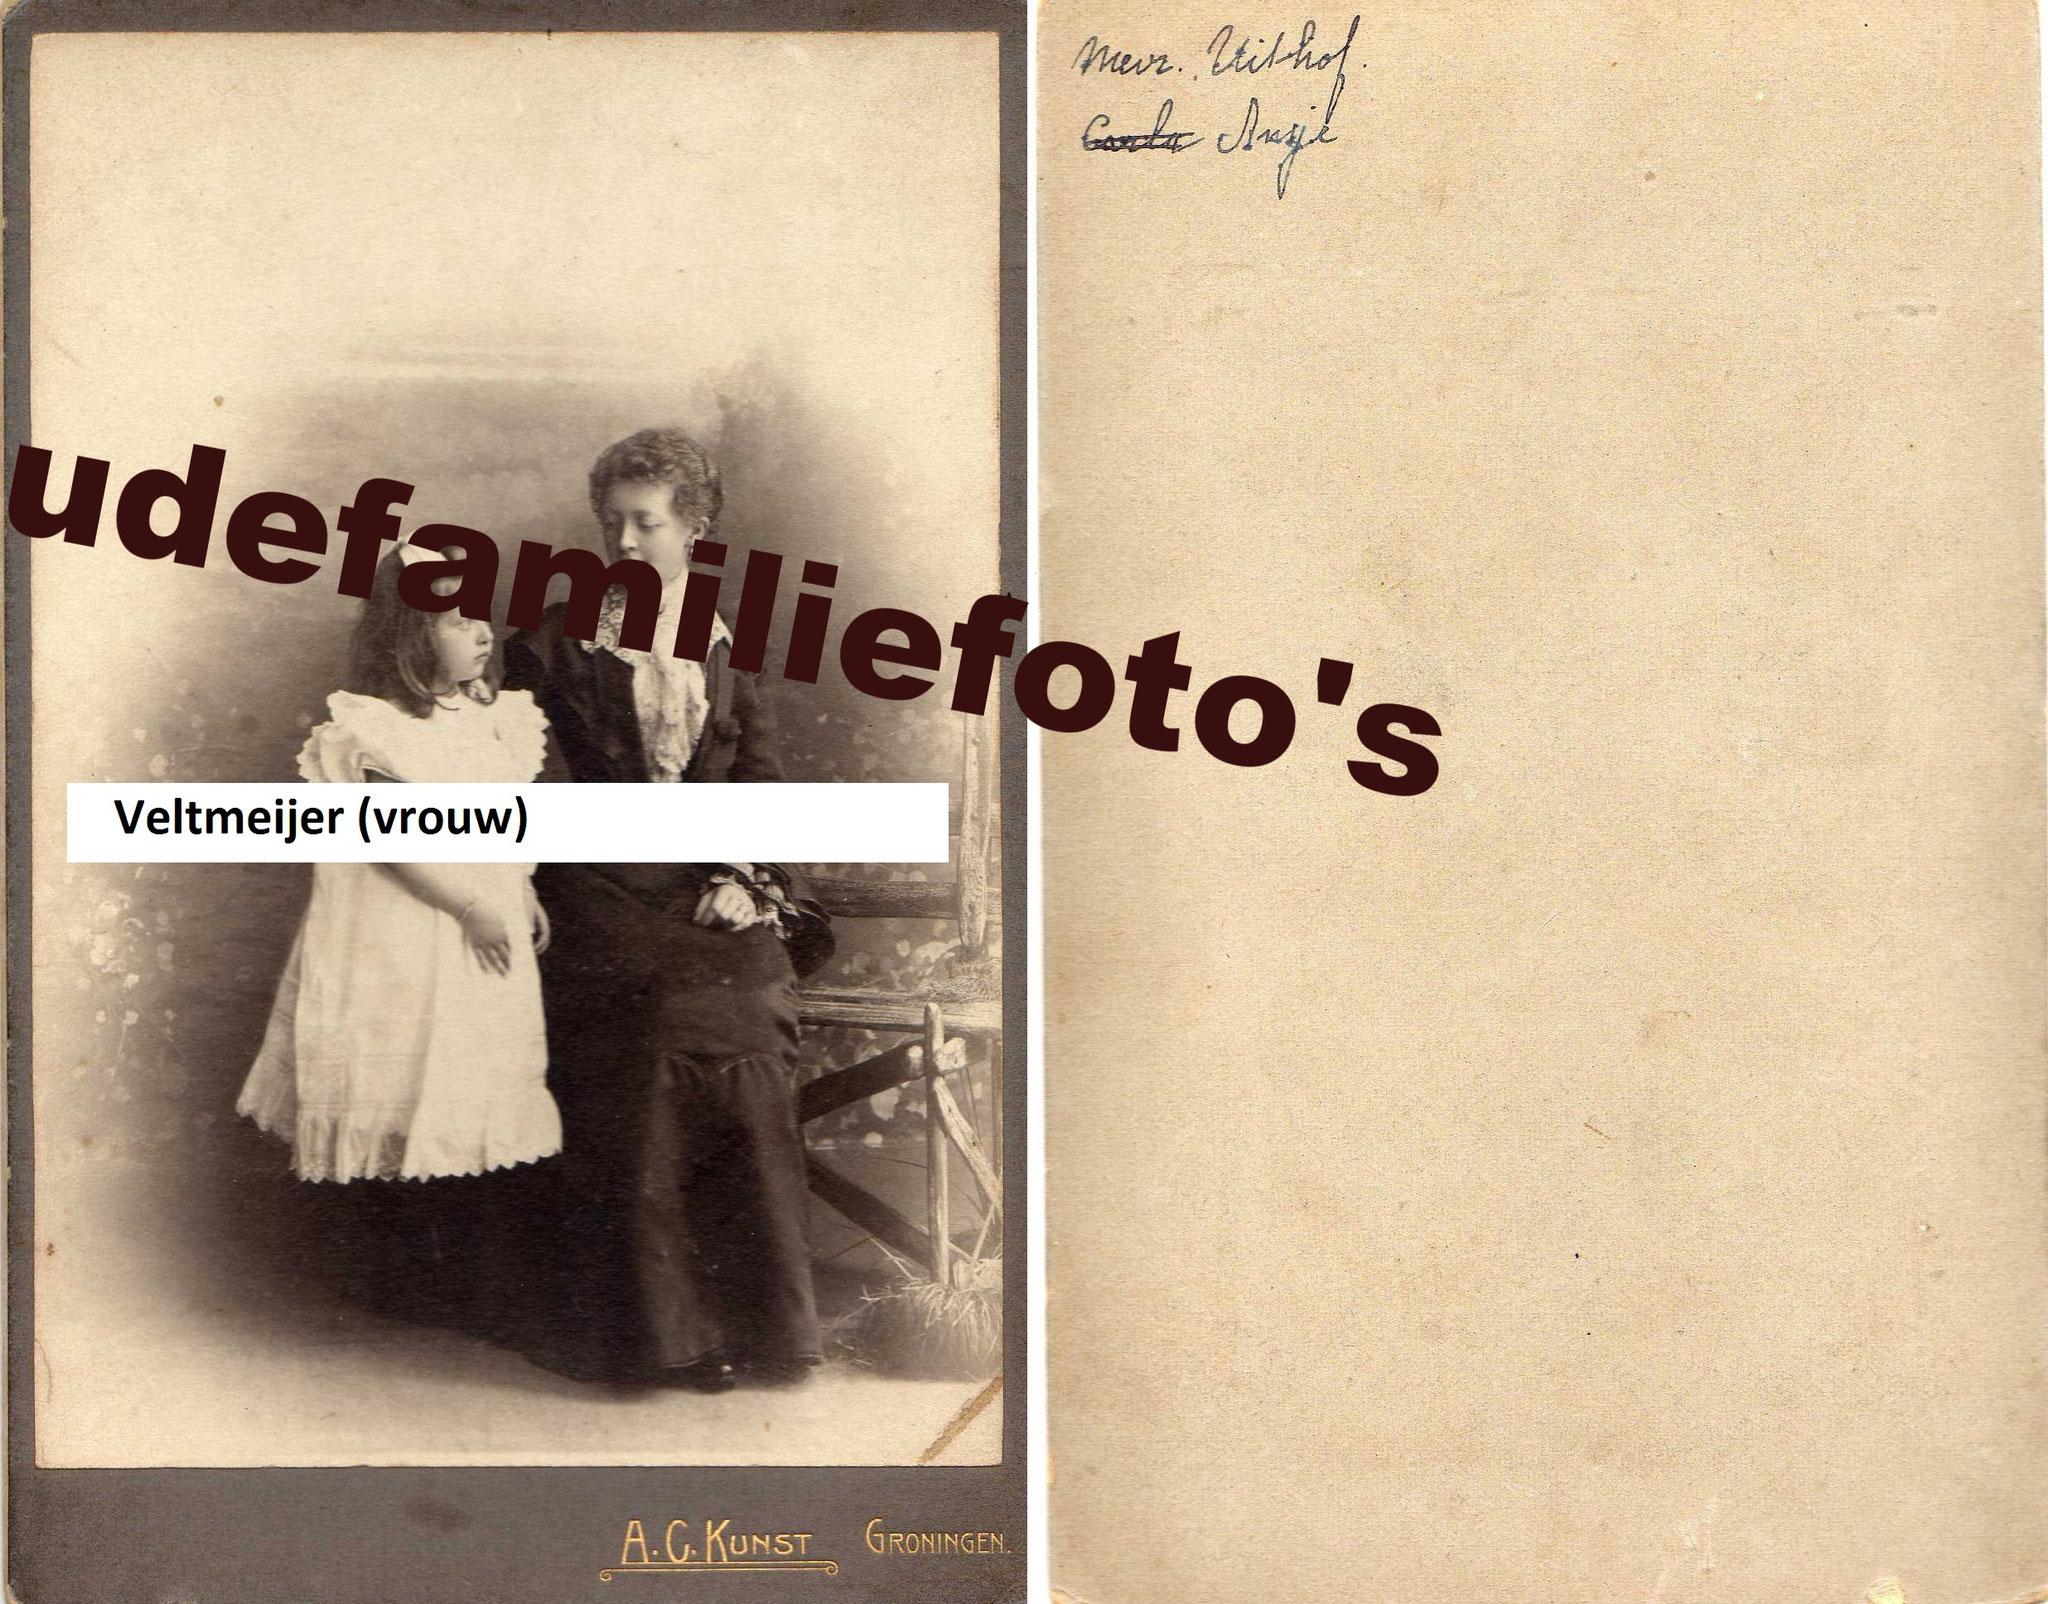 Veltmeijer, Johanna Everdina. (vrouw) geb: 12-8-1871 Rotterdam ovl: 27-11-1931. gehuwd met Carel Johan Uithof. € 4,00